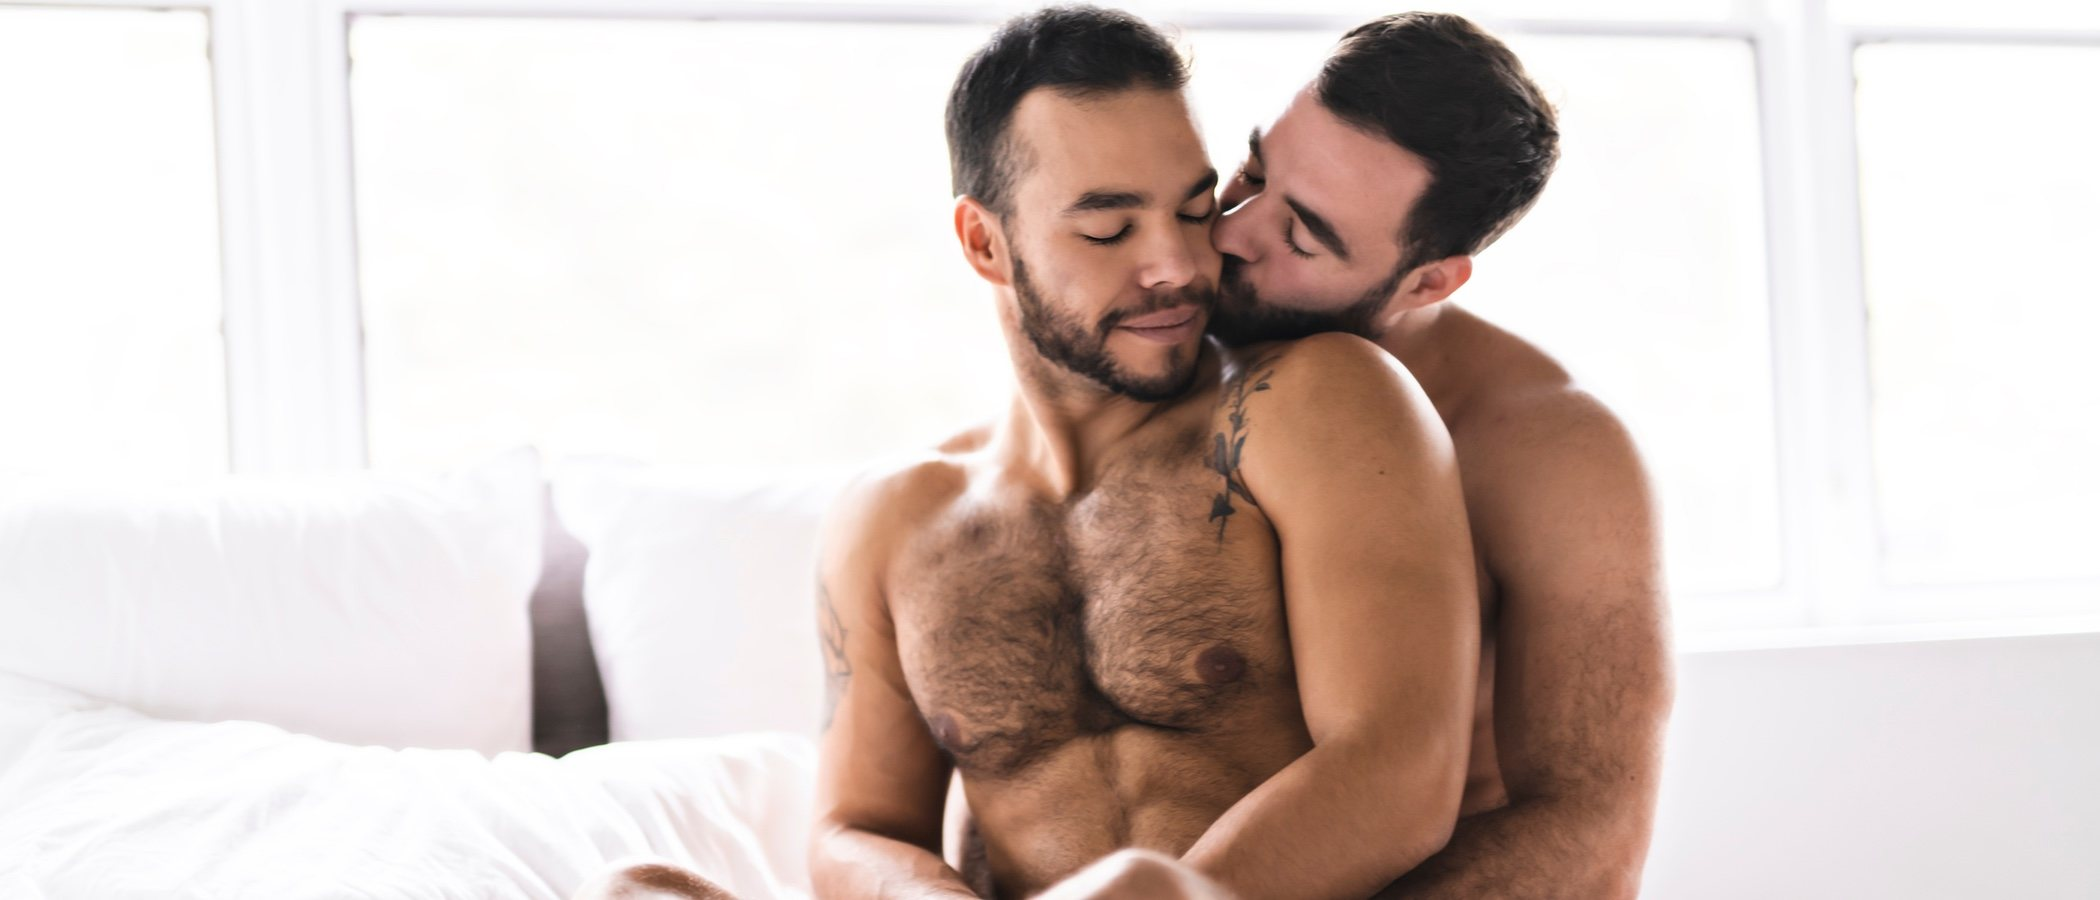 Horóscopo sexual julio 2019: Cáncer